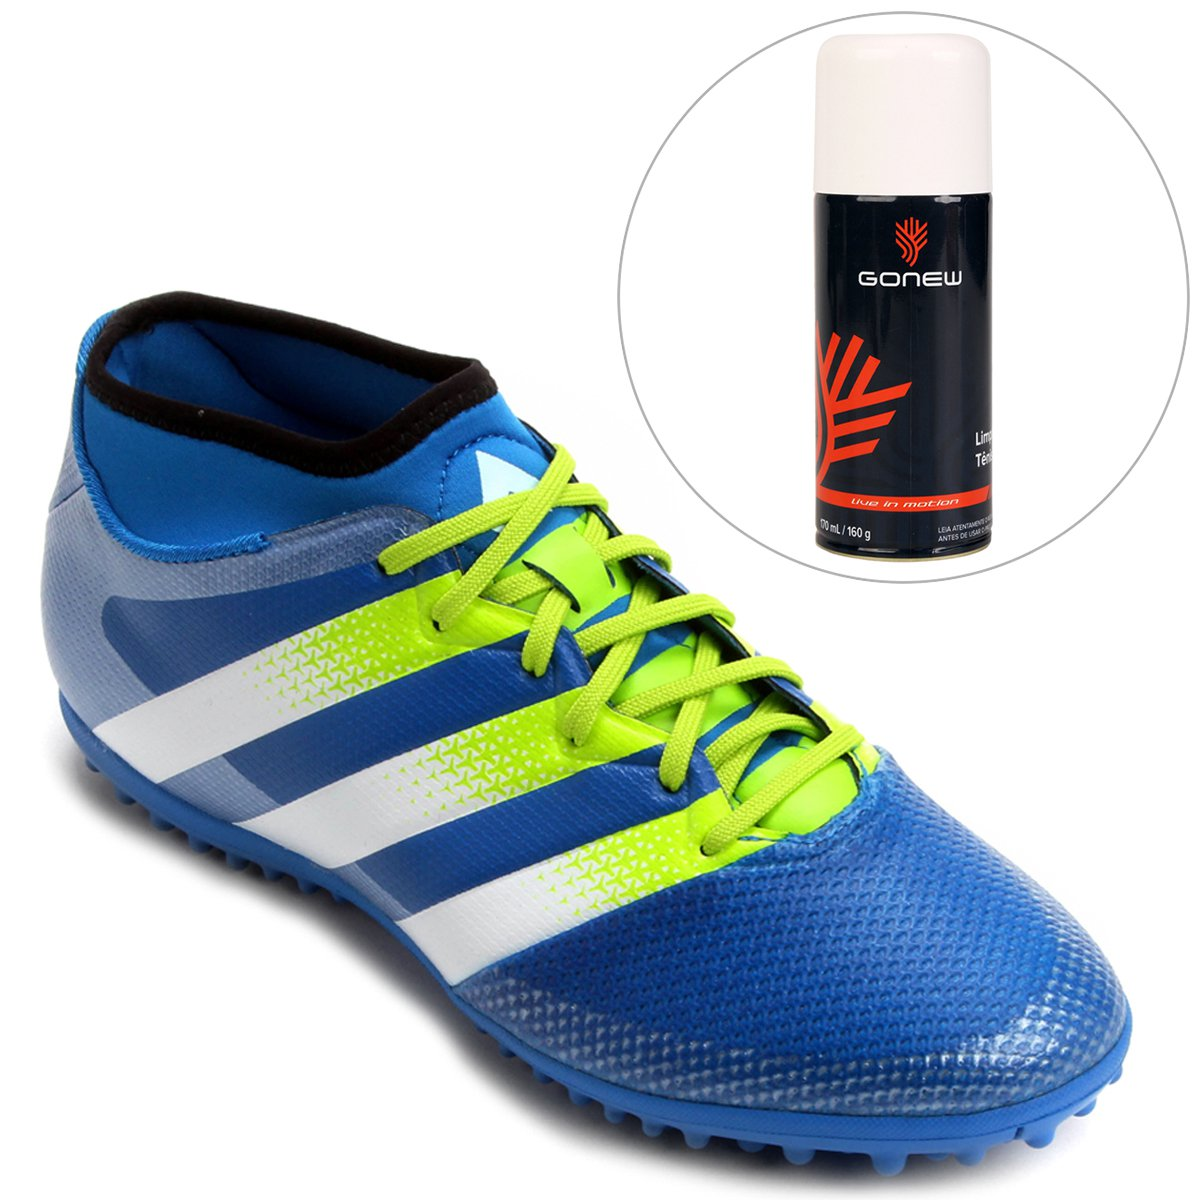 201dc6d0ea Kit Chuteira Adidas Ace 16.3 Primemesh TF Society + Limpa Tênis - Gonew -  Compre Agora